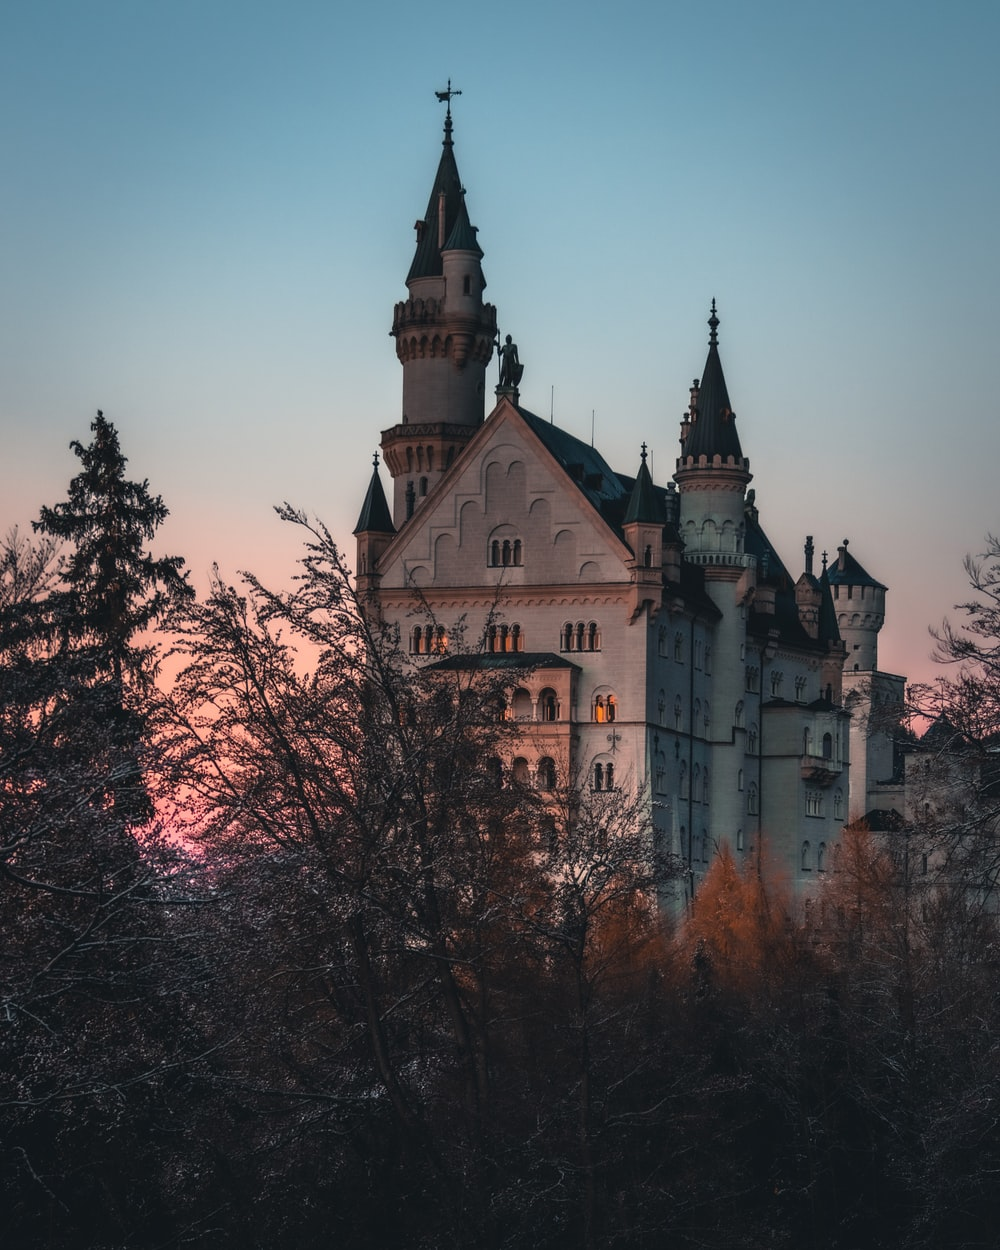 brown and gray concrete castle